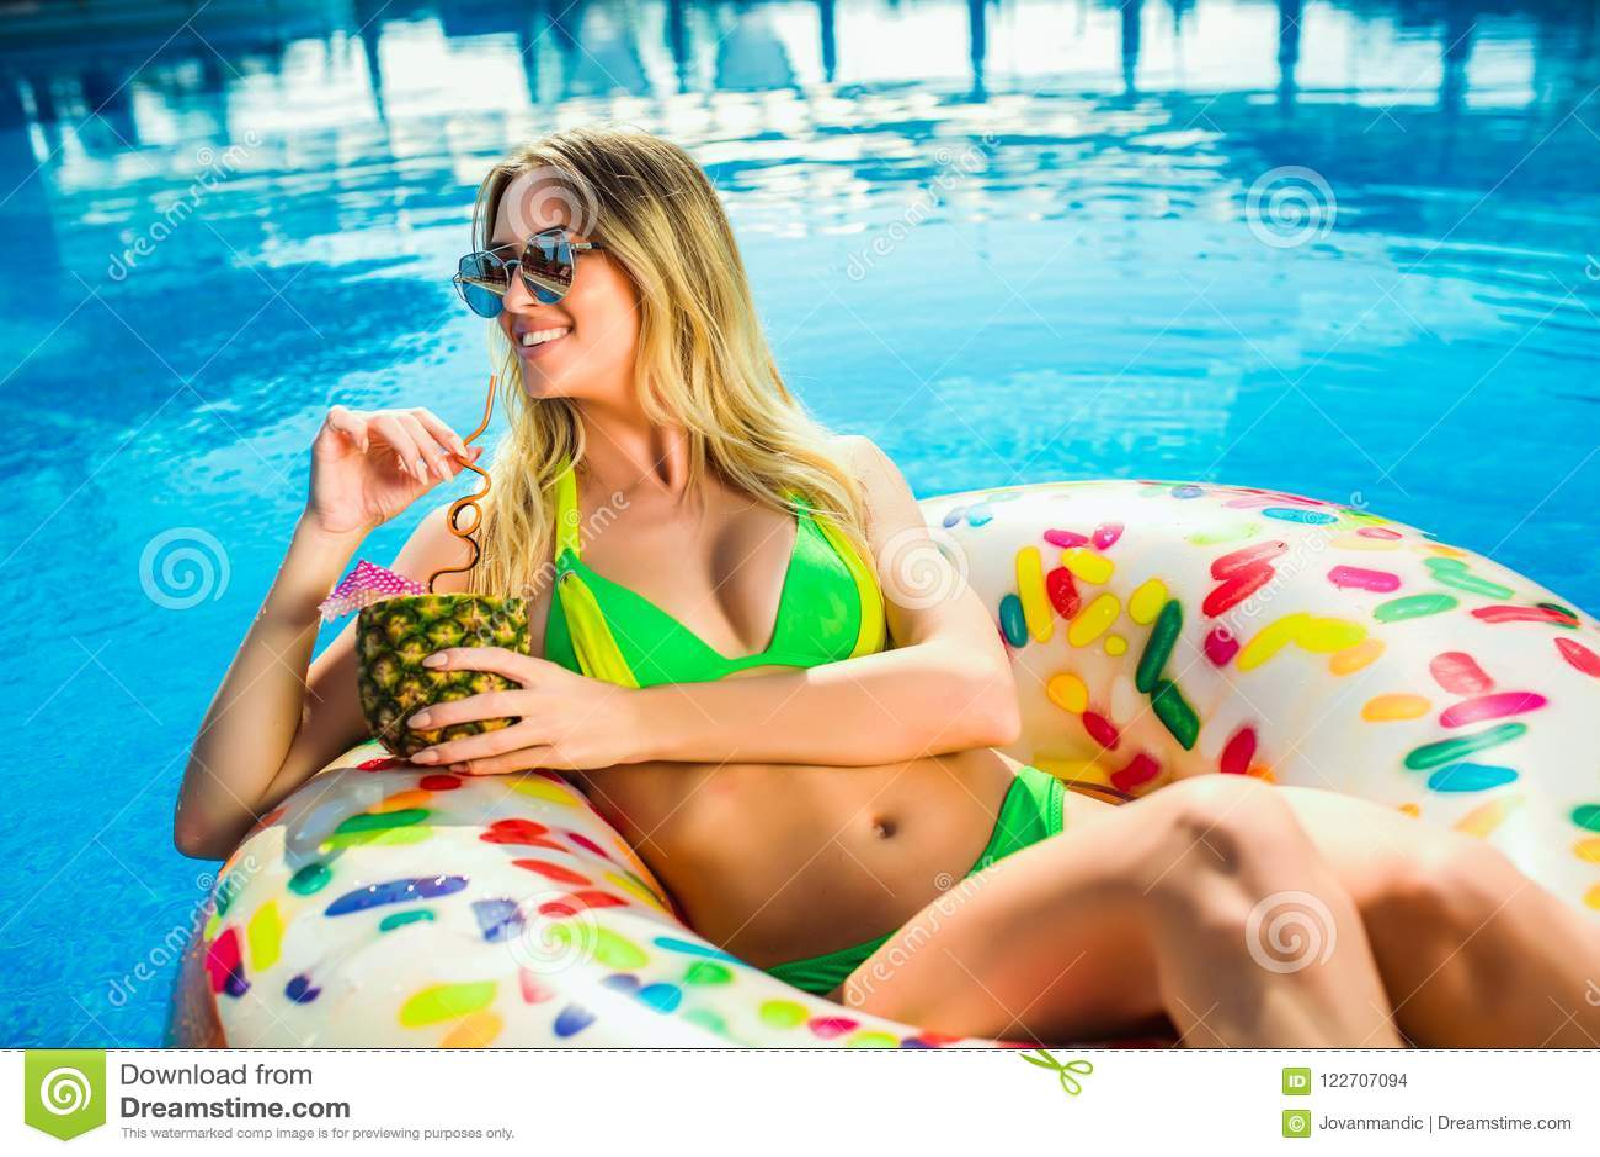 Frau im Bikini auf der aufblasbaren Matratze im Swimmingpool